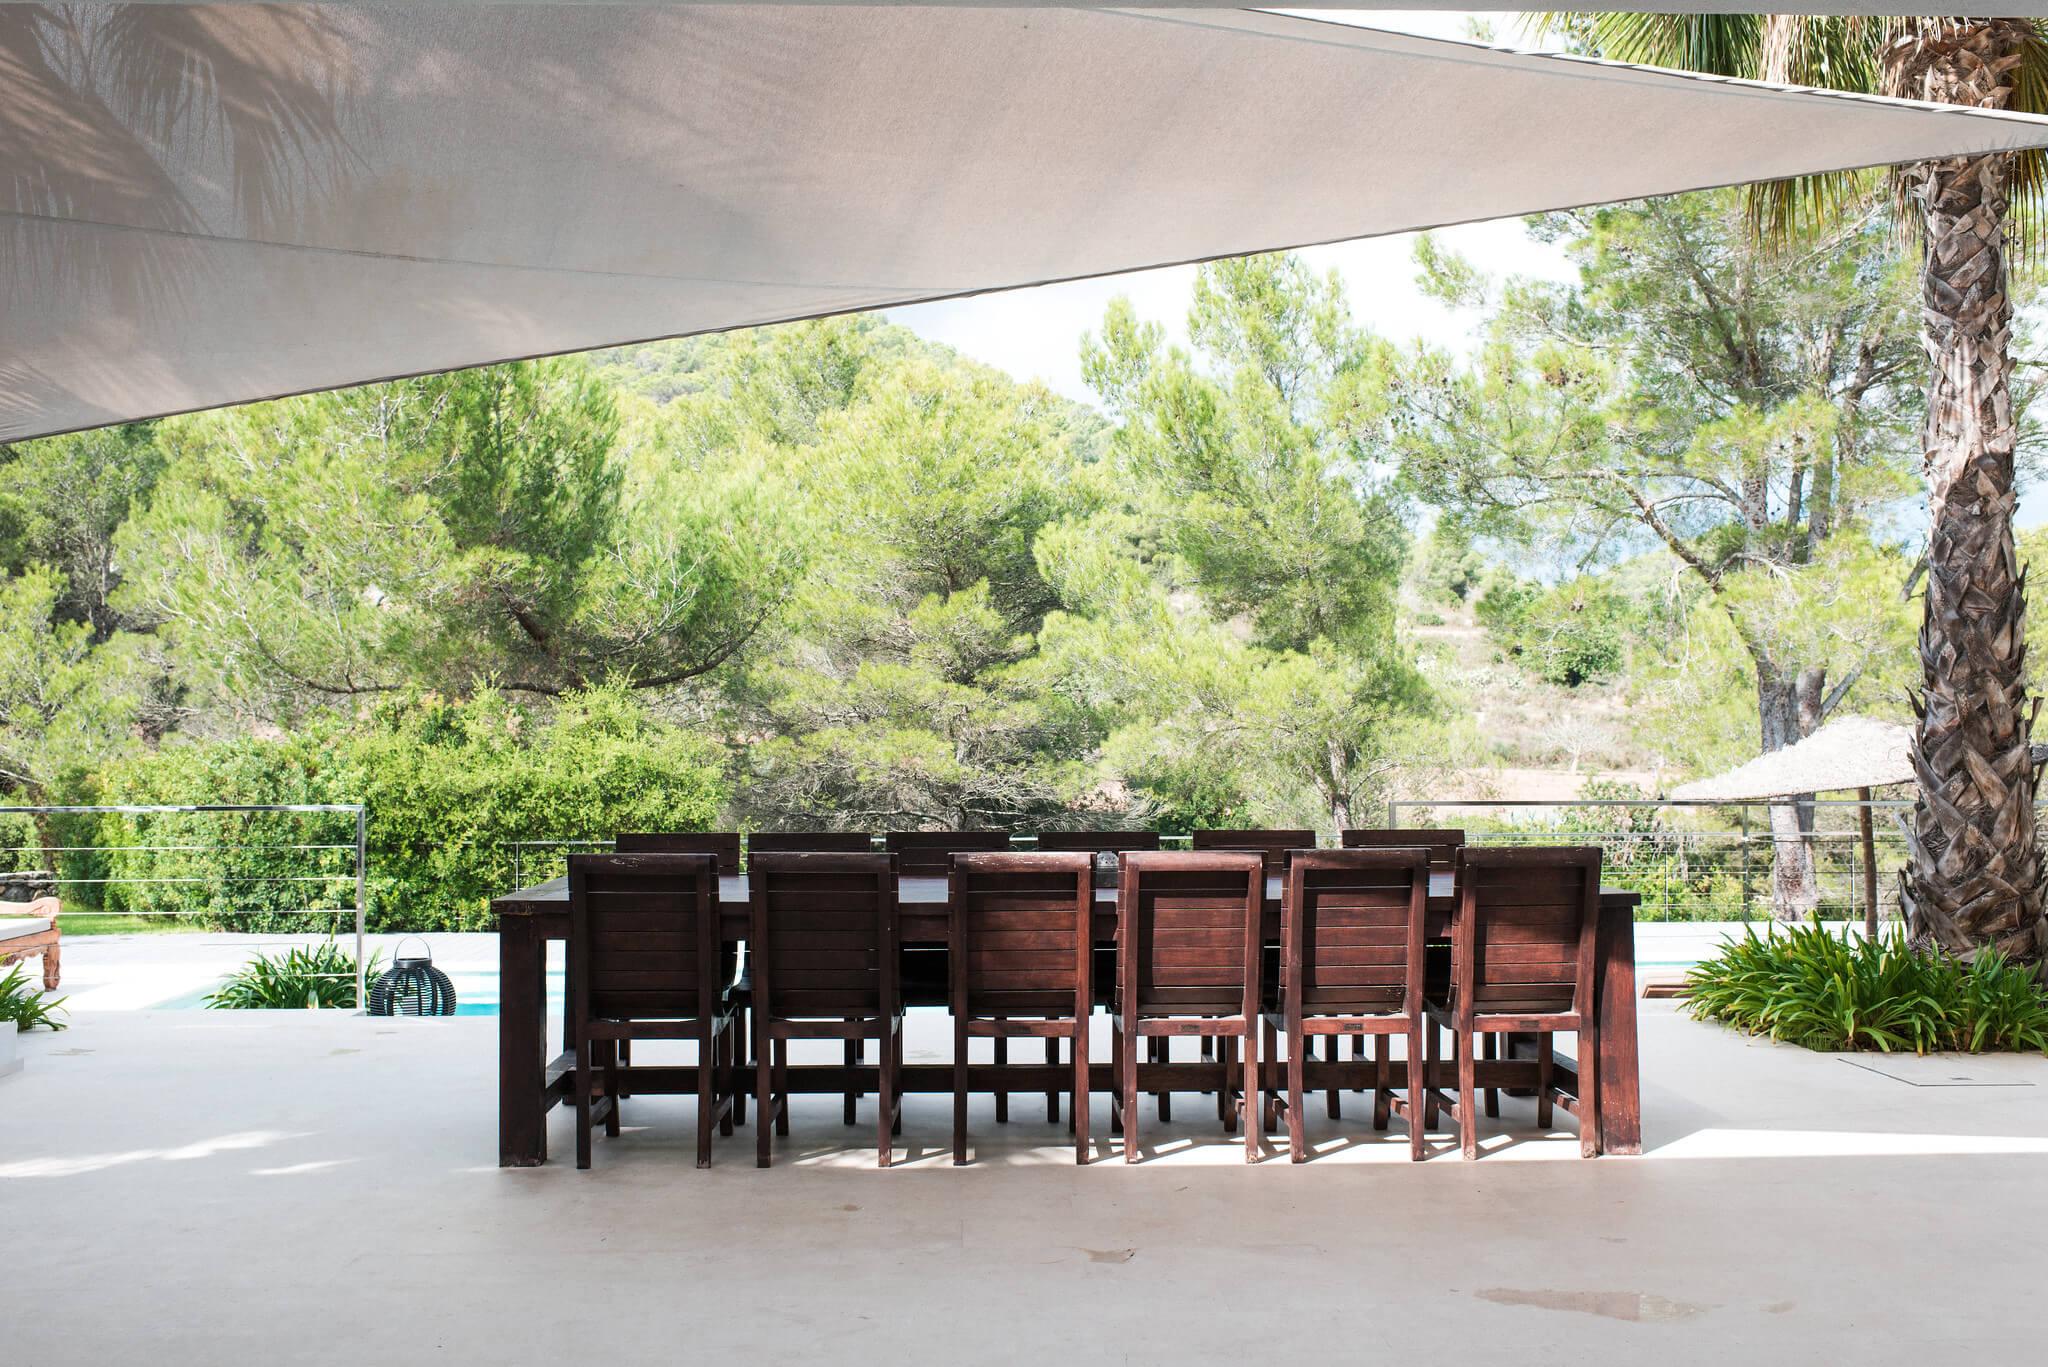 https://www.white-ibiza.com/wp-content/uploads/2020/05/white-ibiza-villas-casa-estrella-exterior-outside-dining.jpg